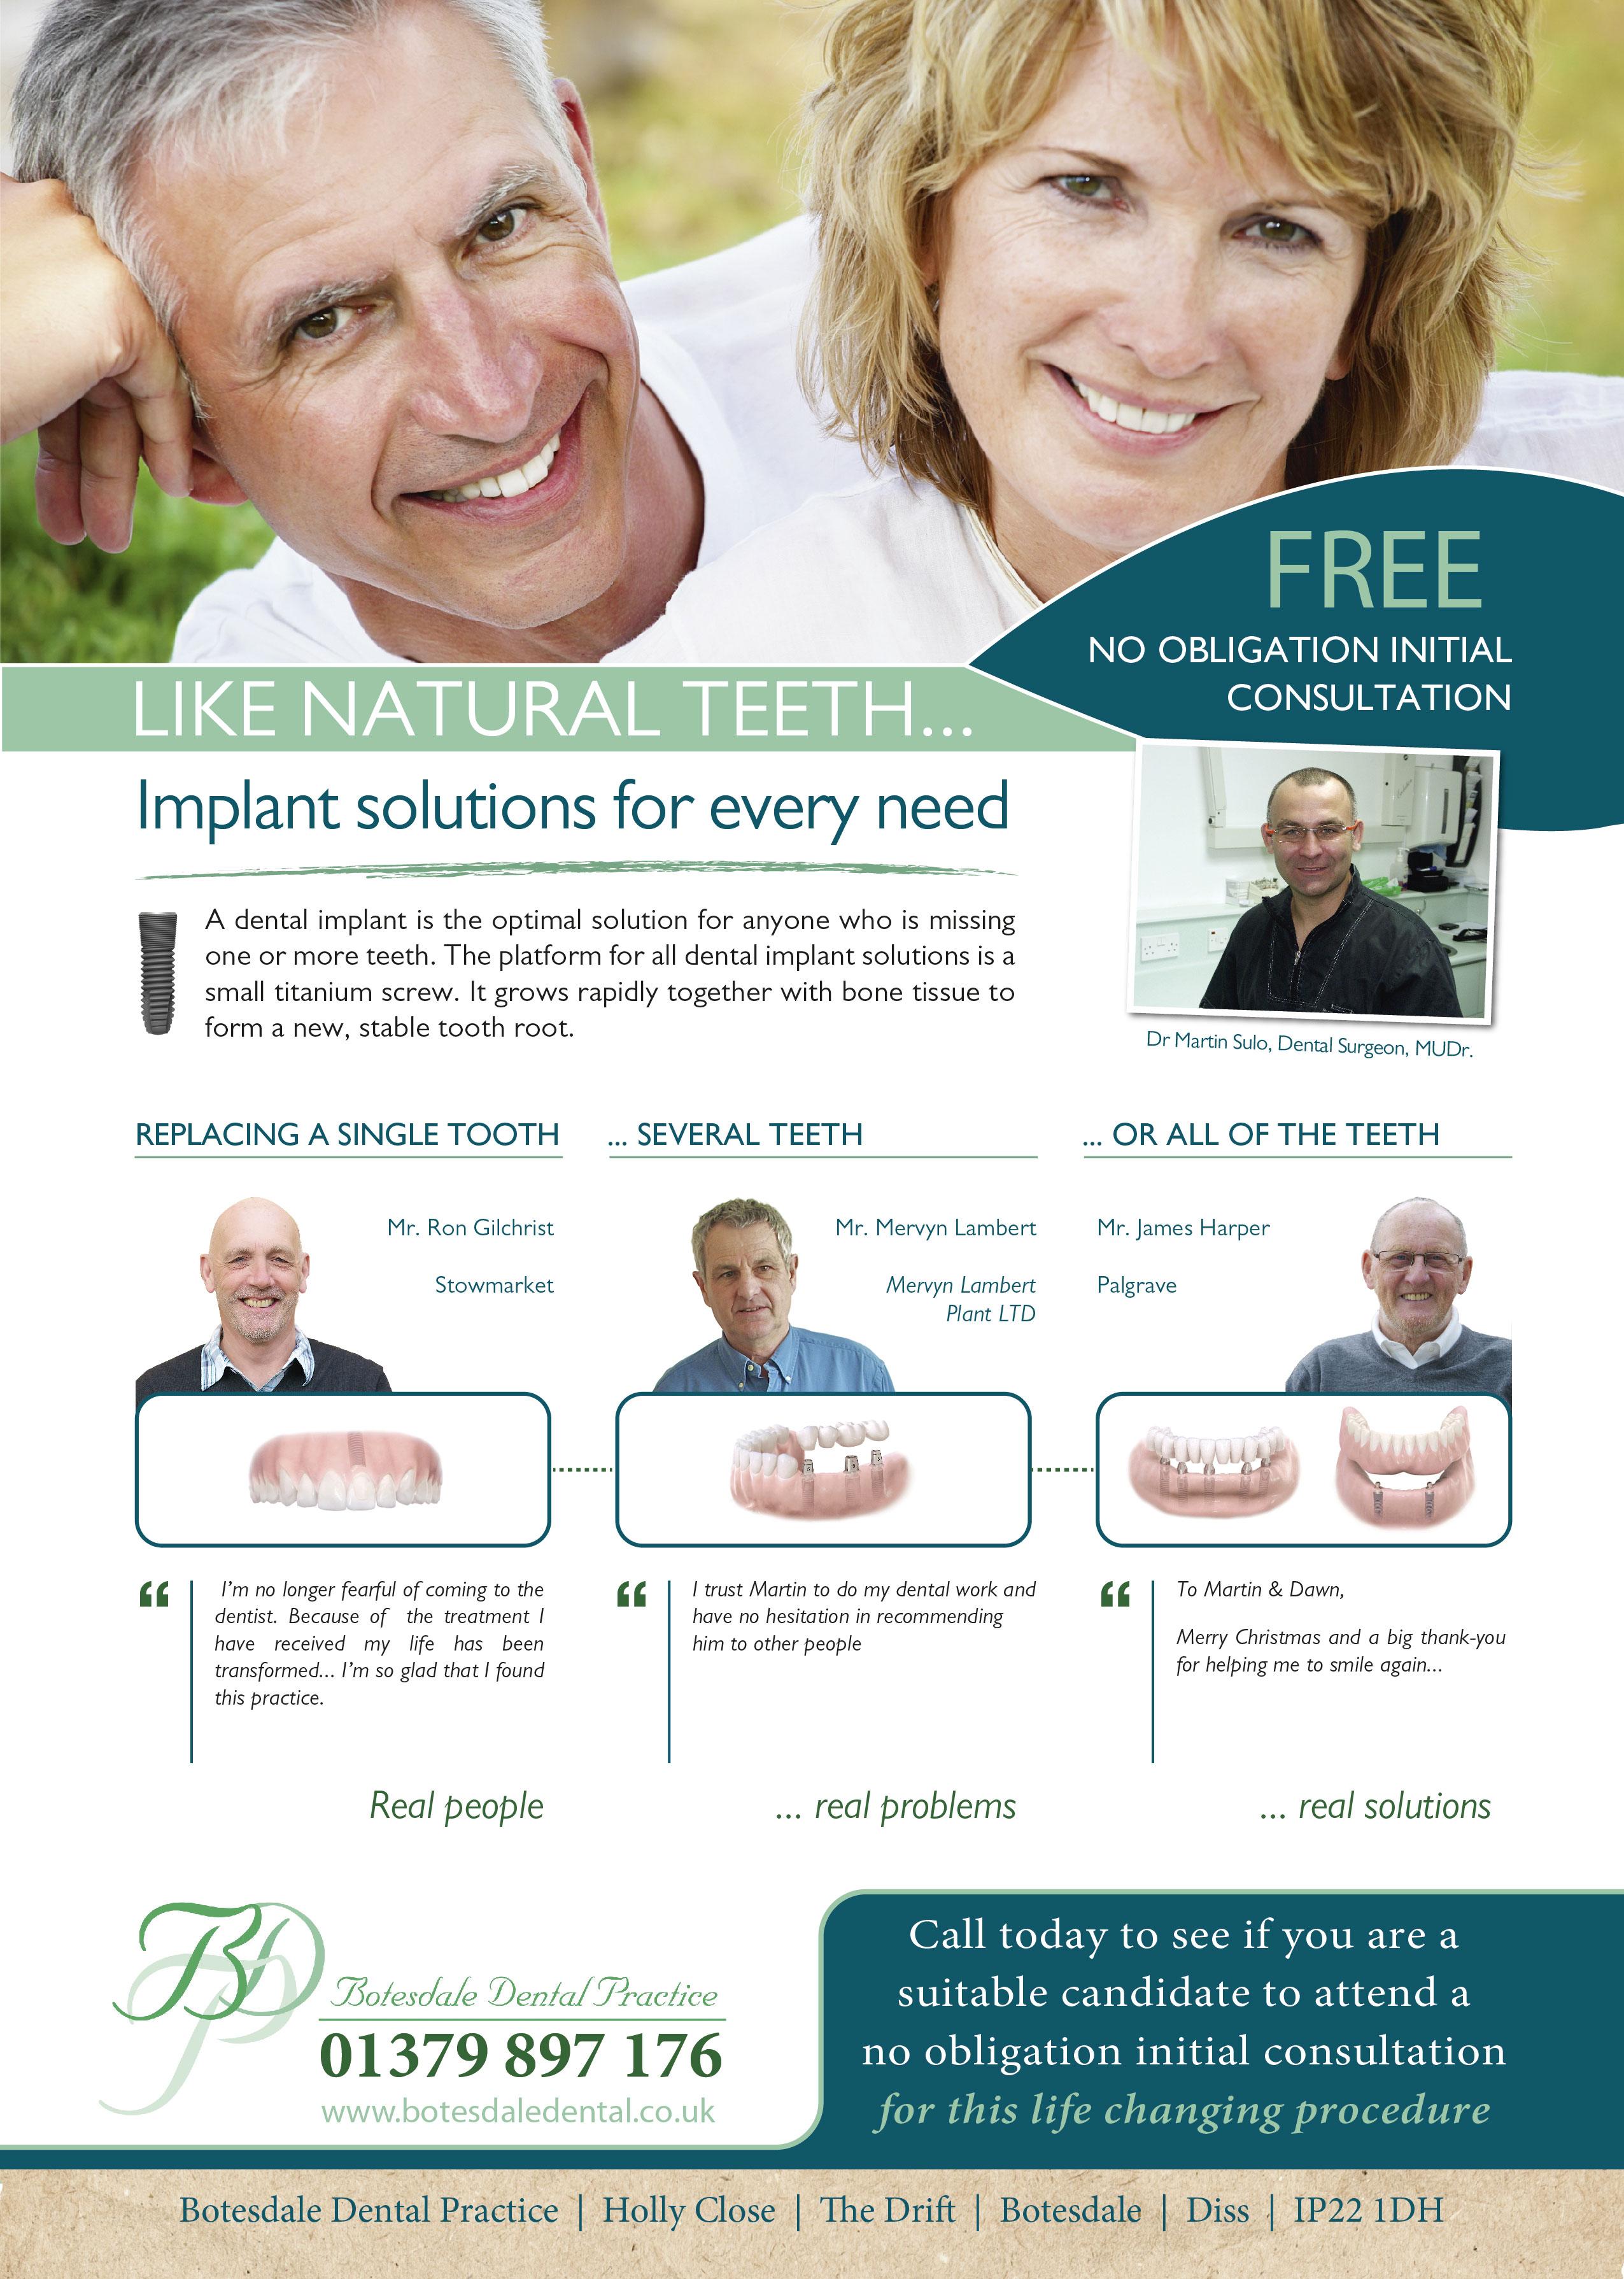 Botesdale Dental Practice Testimonials